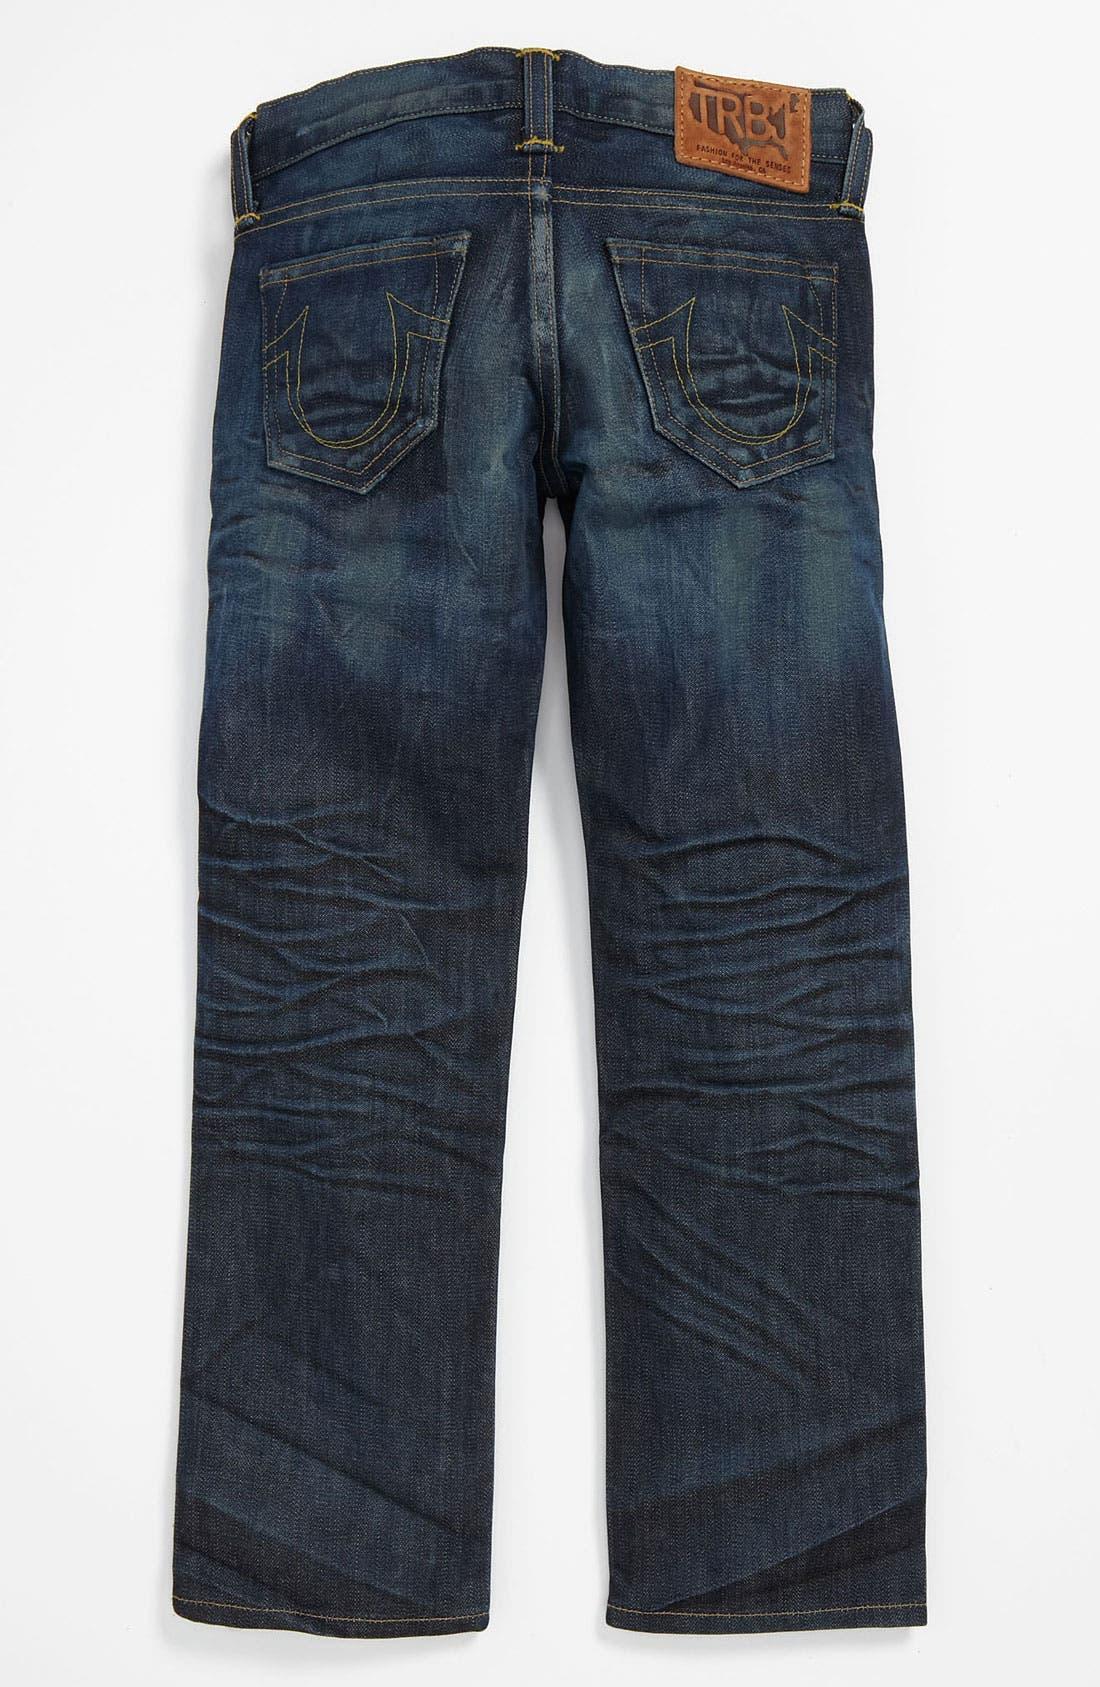 Main Image - True Religion Brand Jeans 'Herbie Phoenix' Jeans (Big Boys)